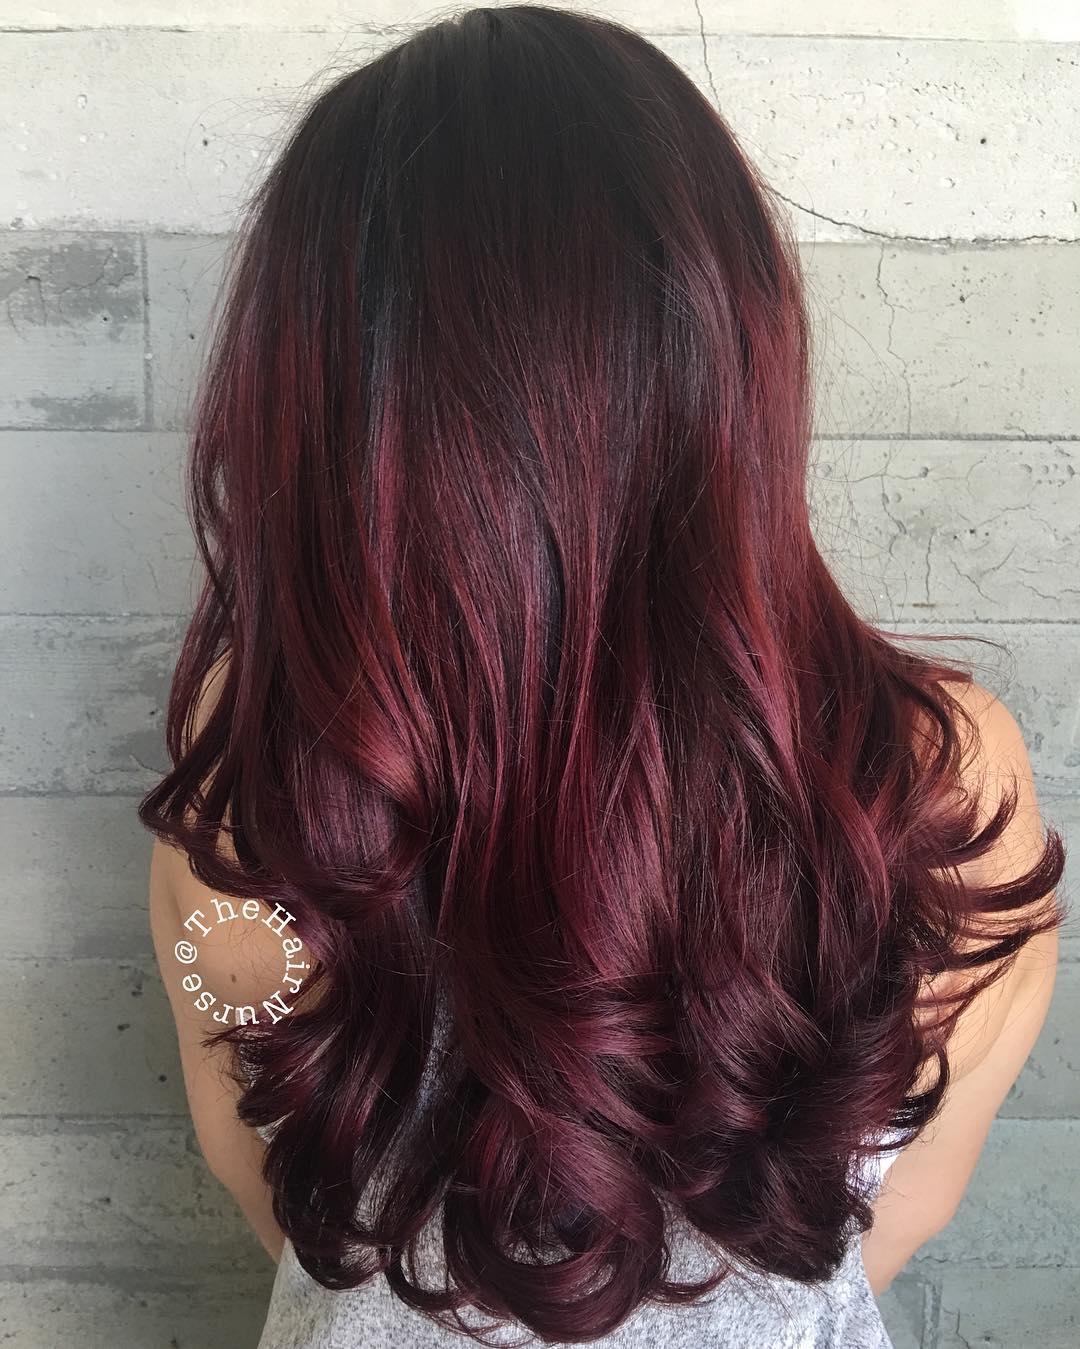 50 Shades Of Burgundy Hair Dark Red Maroon Red Wine